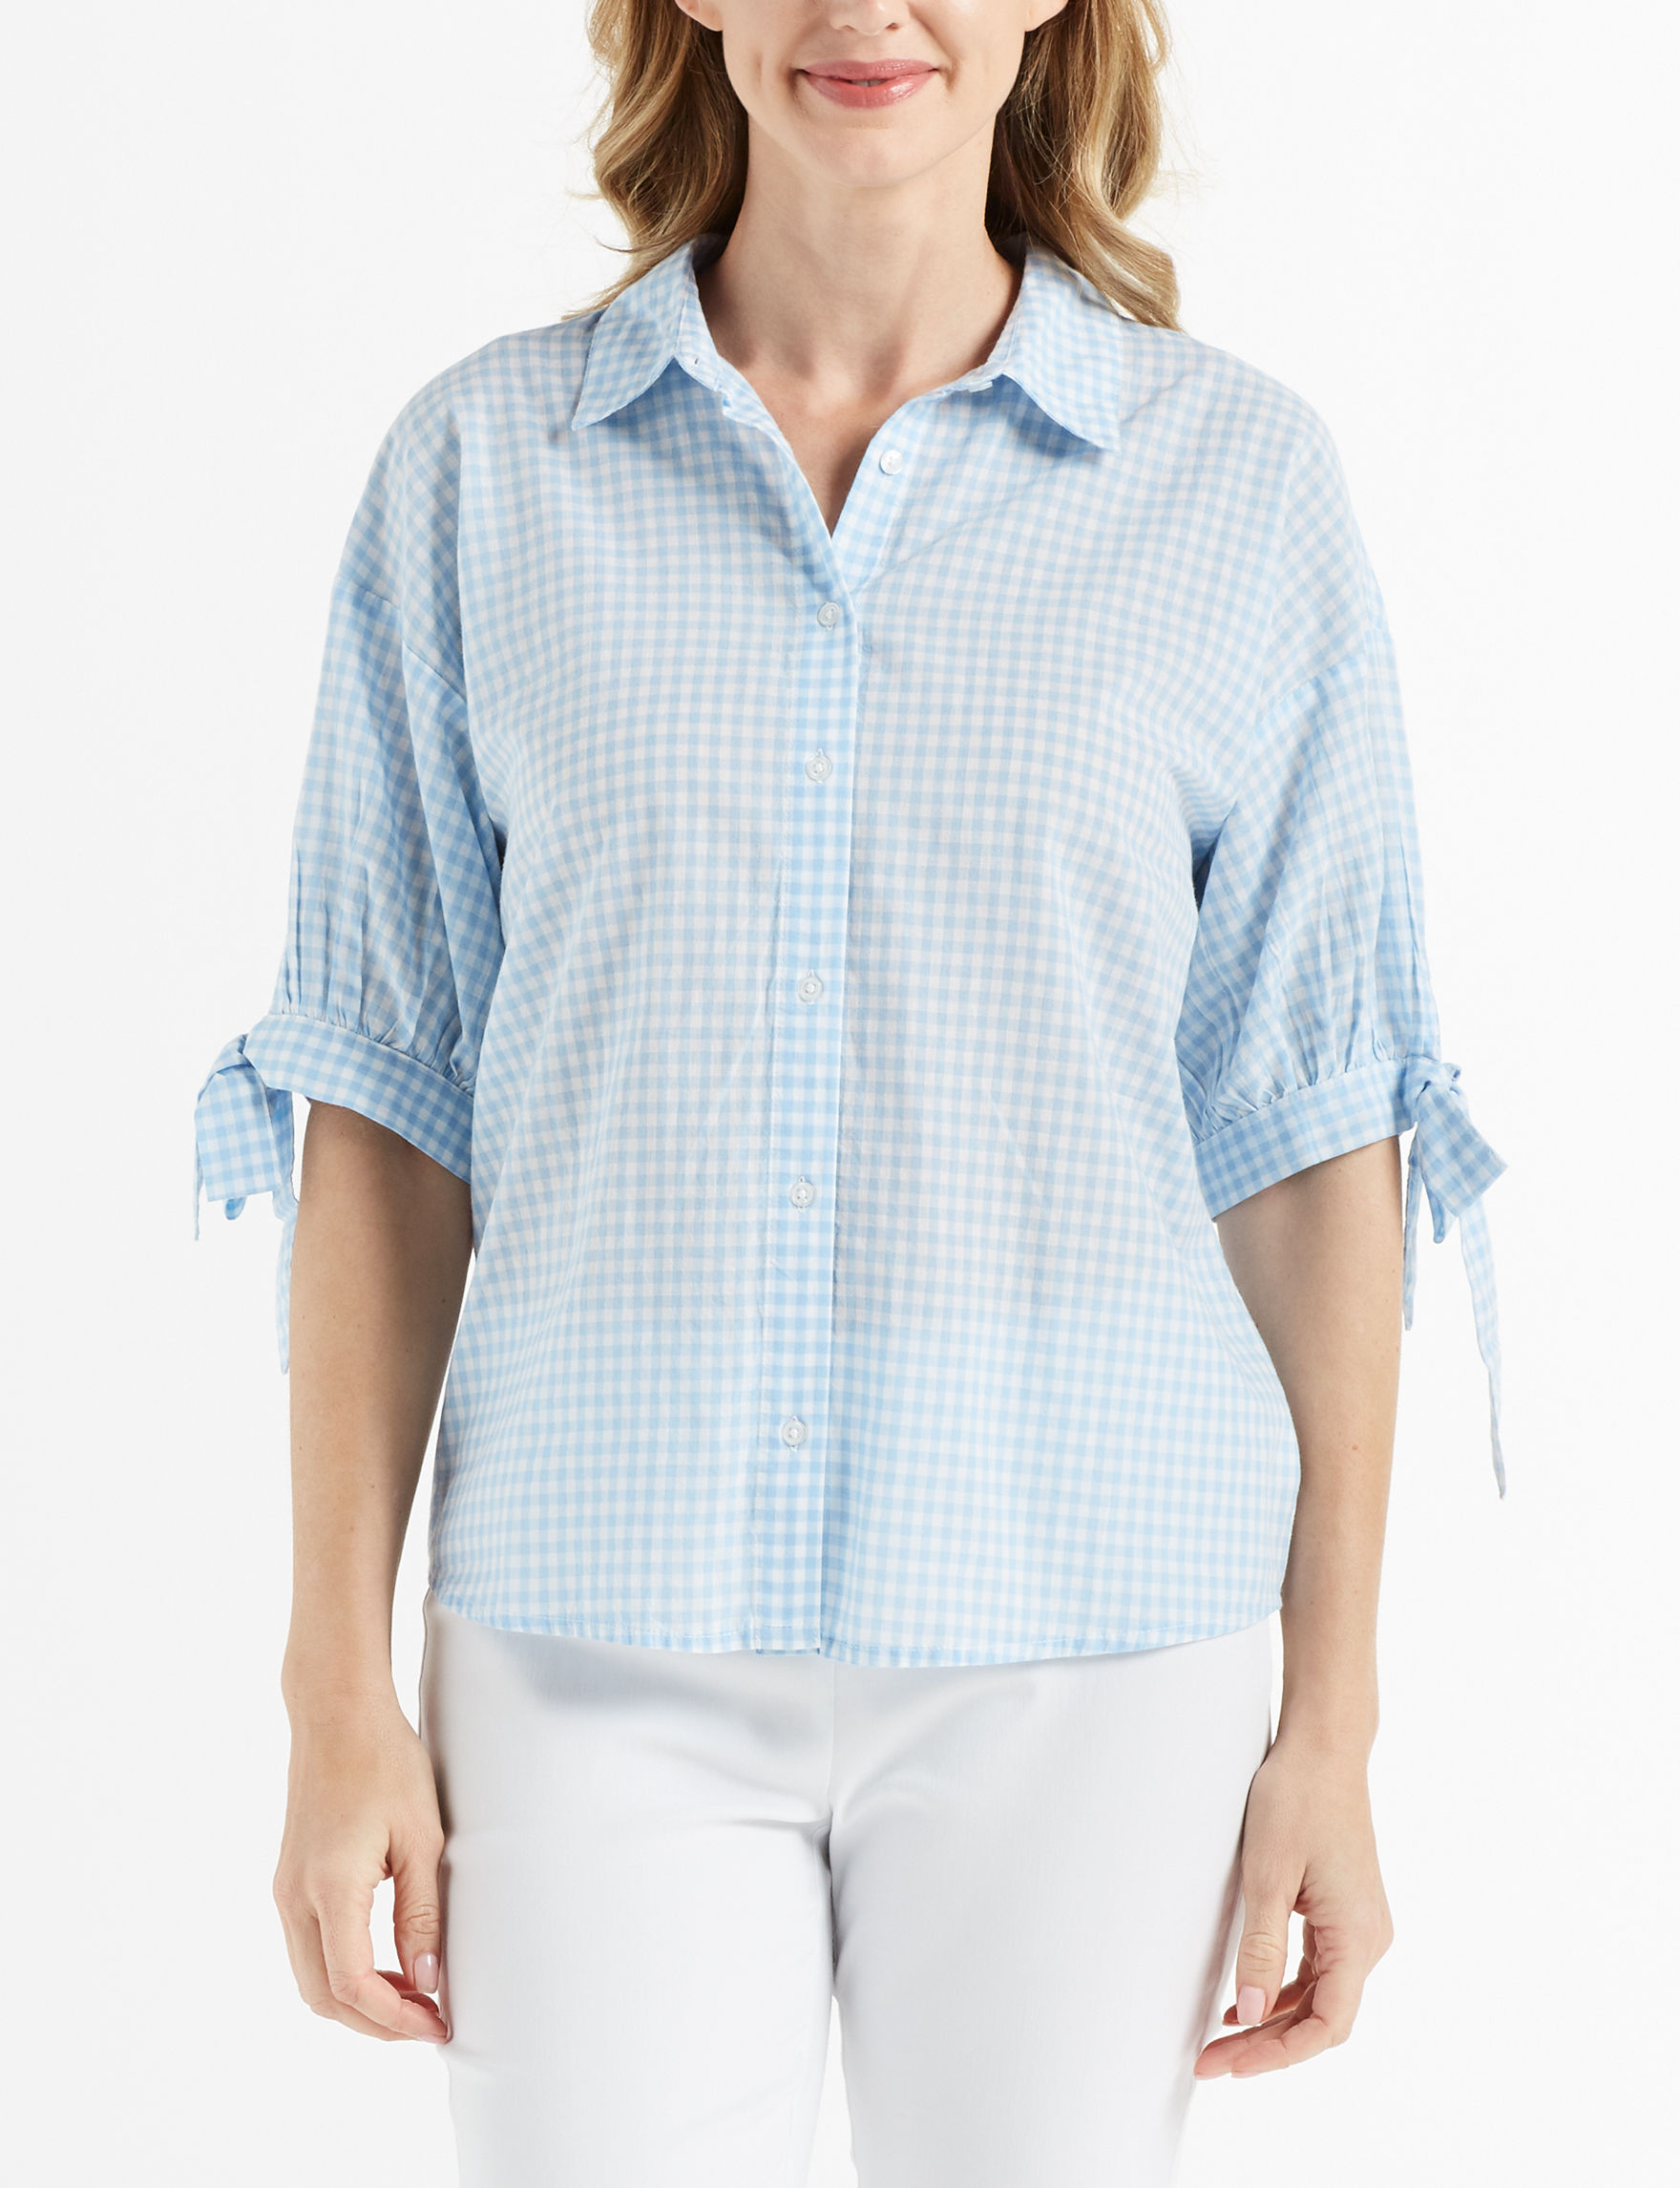 Gloria Vanderbilt Blue Shirts & Blouses